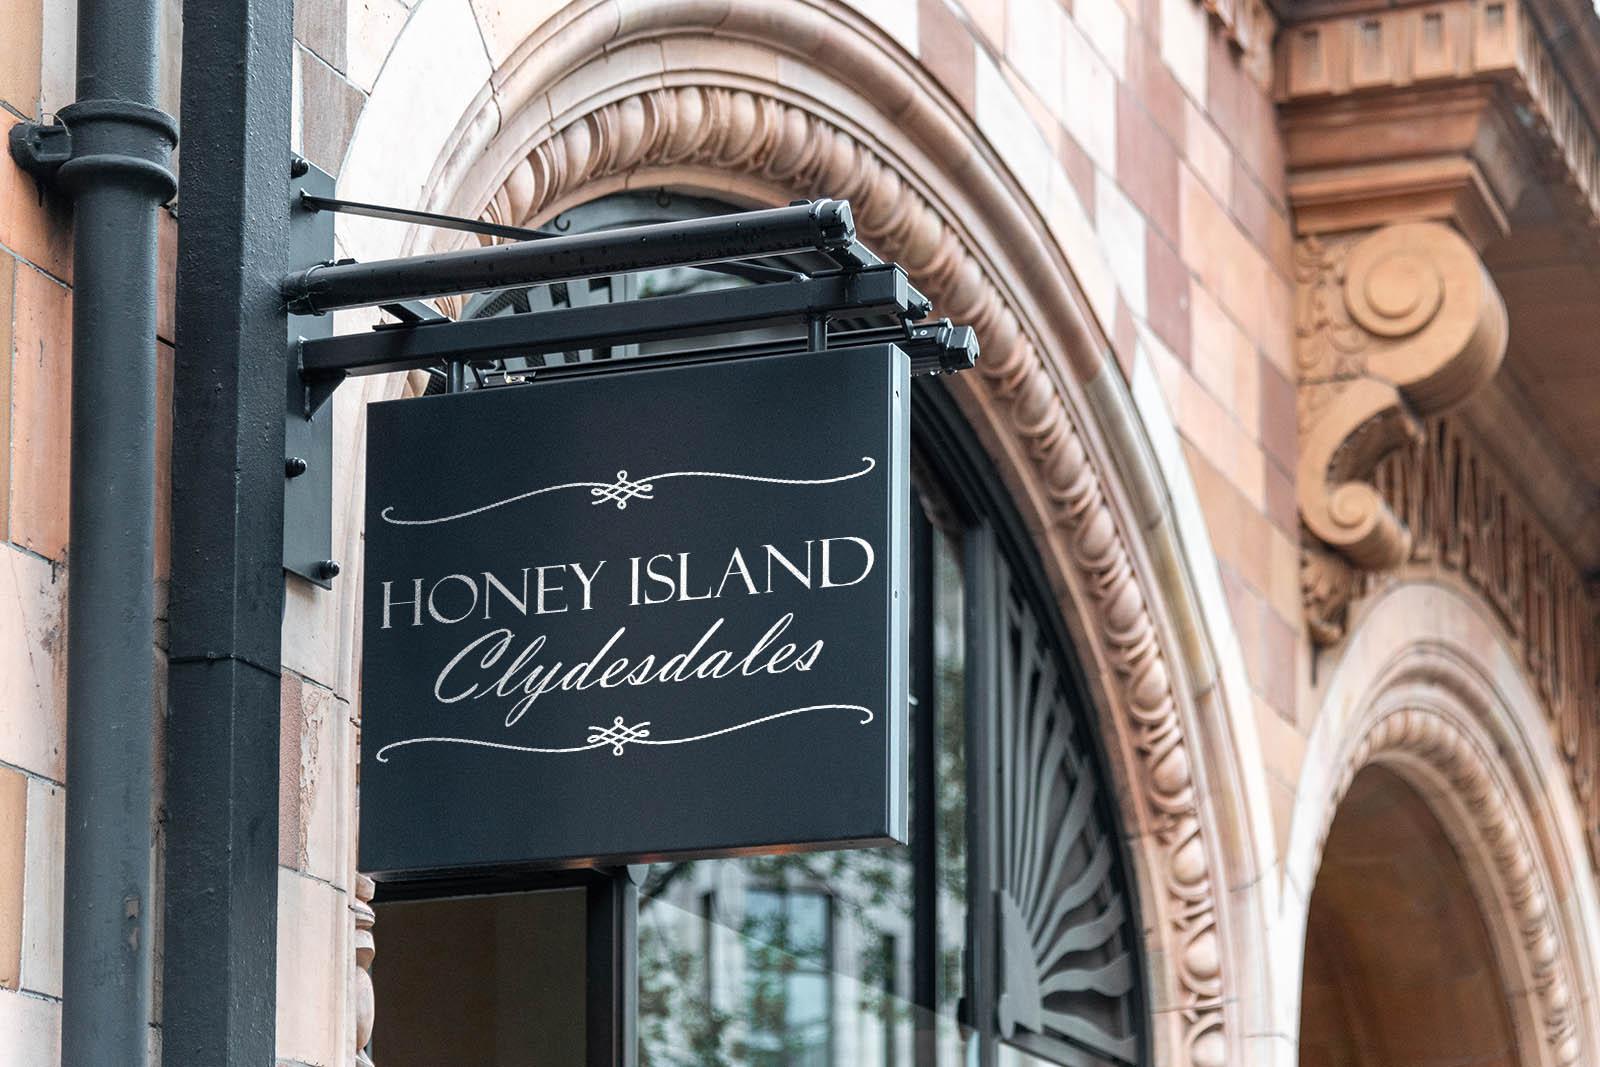 Honey Island Clydesdales logo